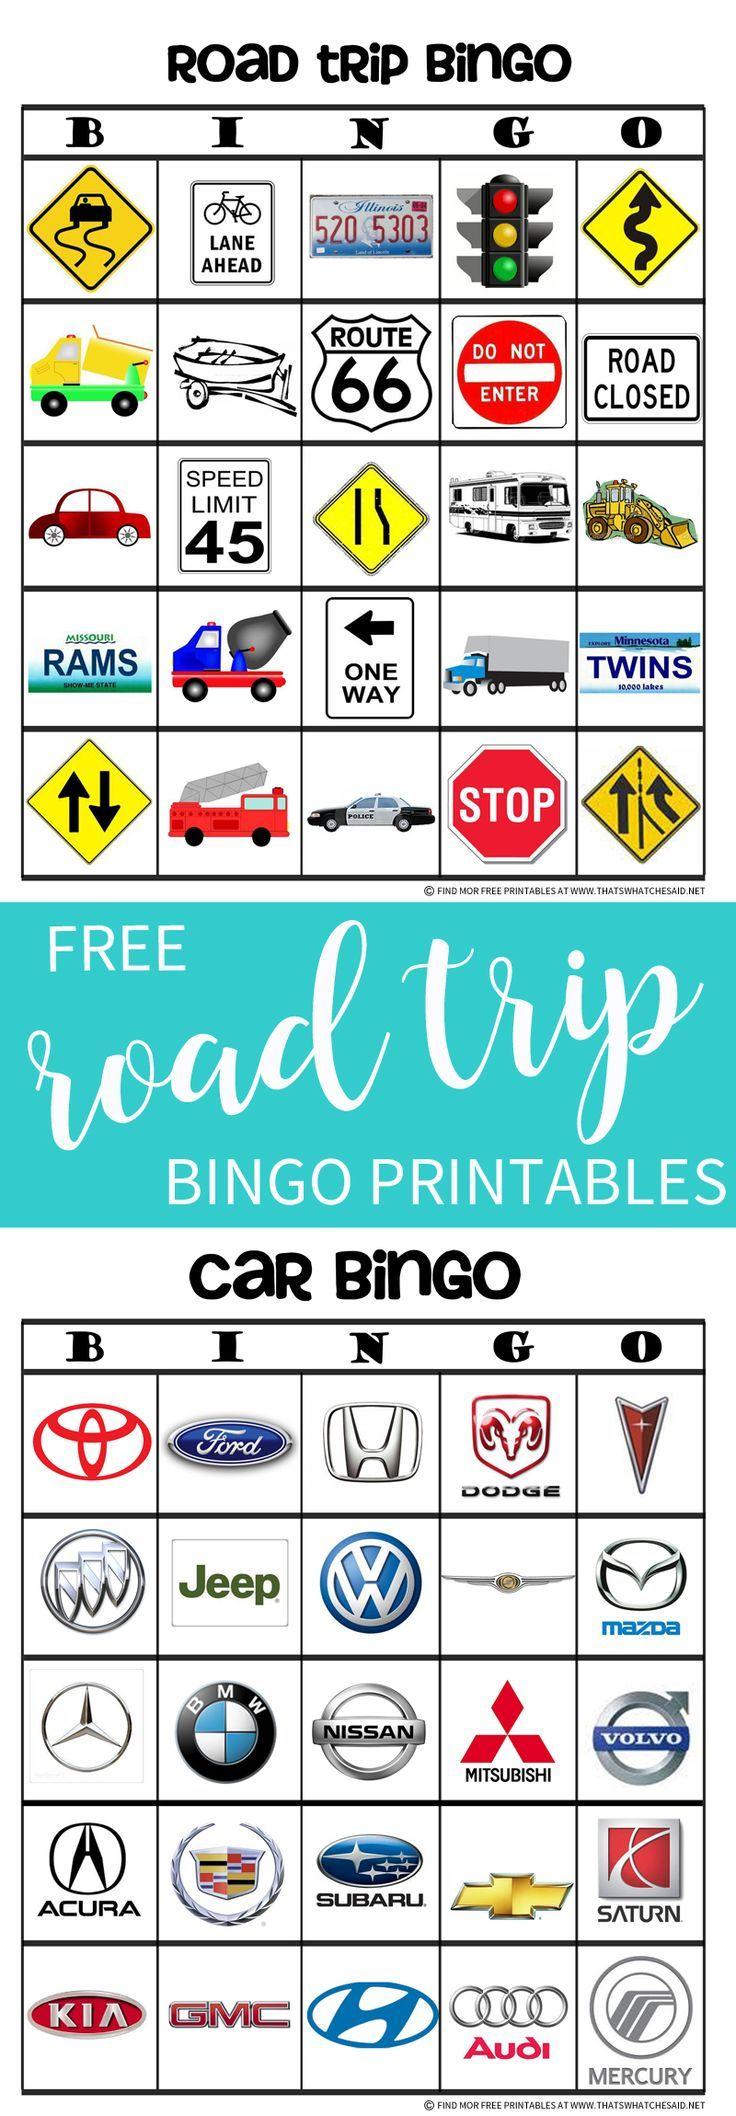 How to scrapbook a road trip - Road Trip Bingo Free Printables